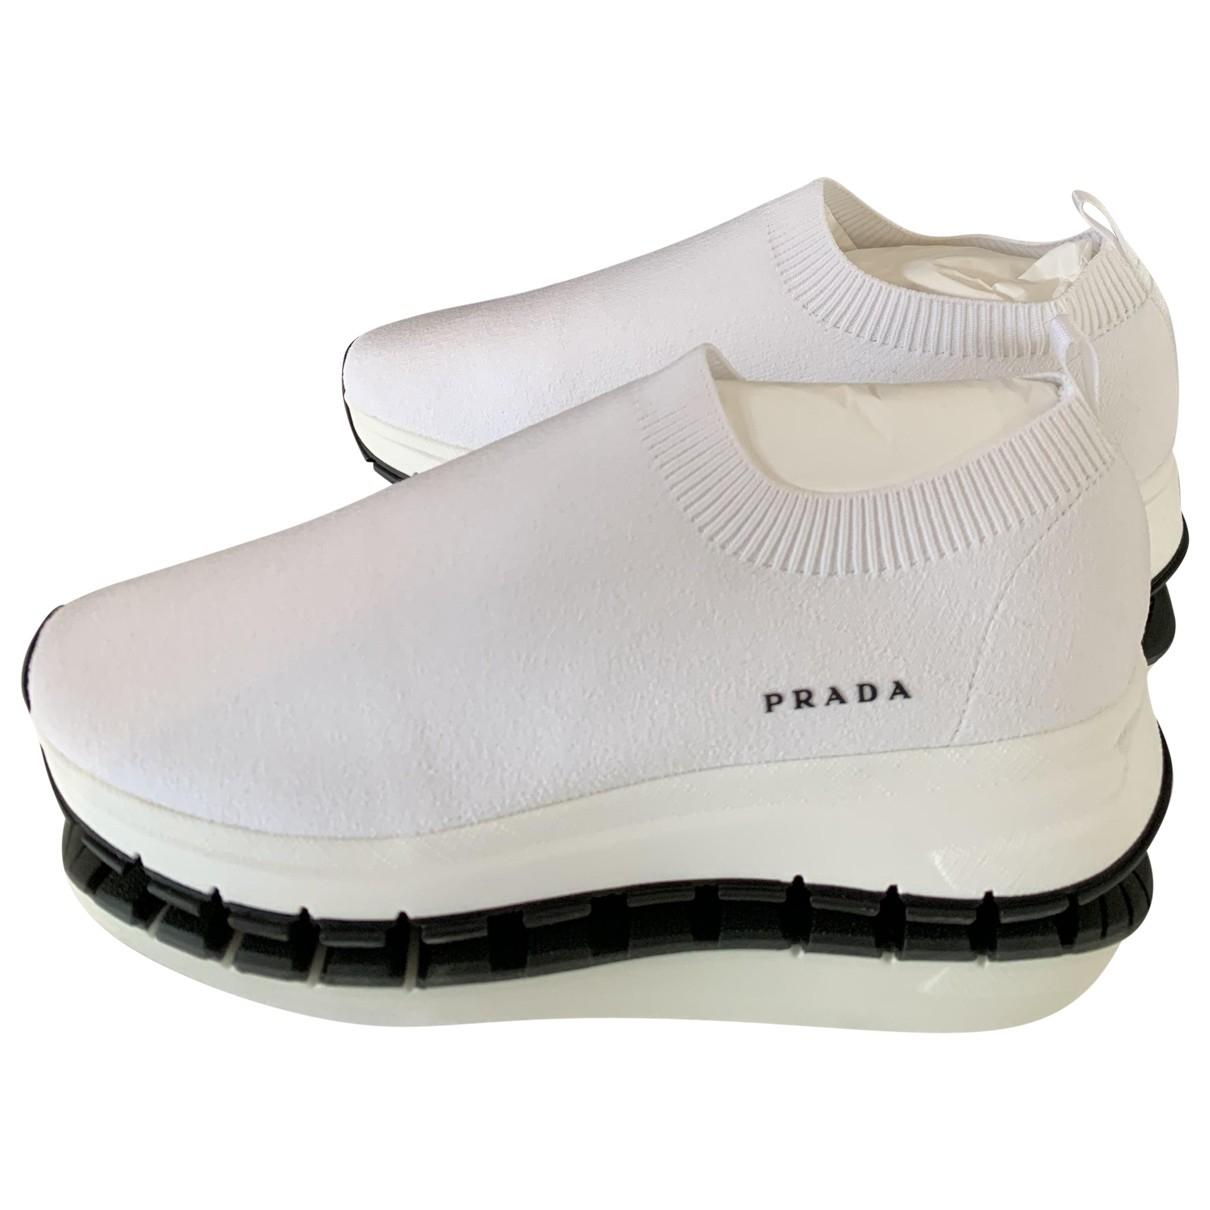 Prada N White Cloth Trainers for Women 39 EU